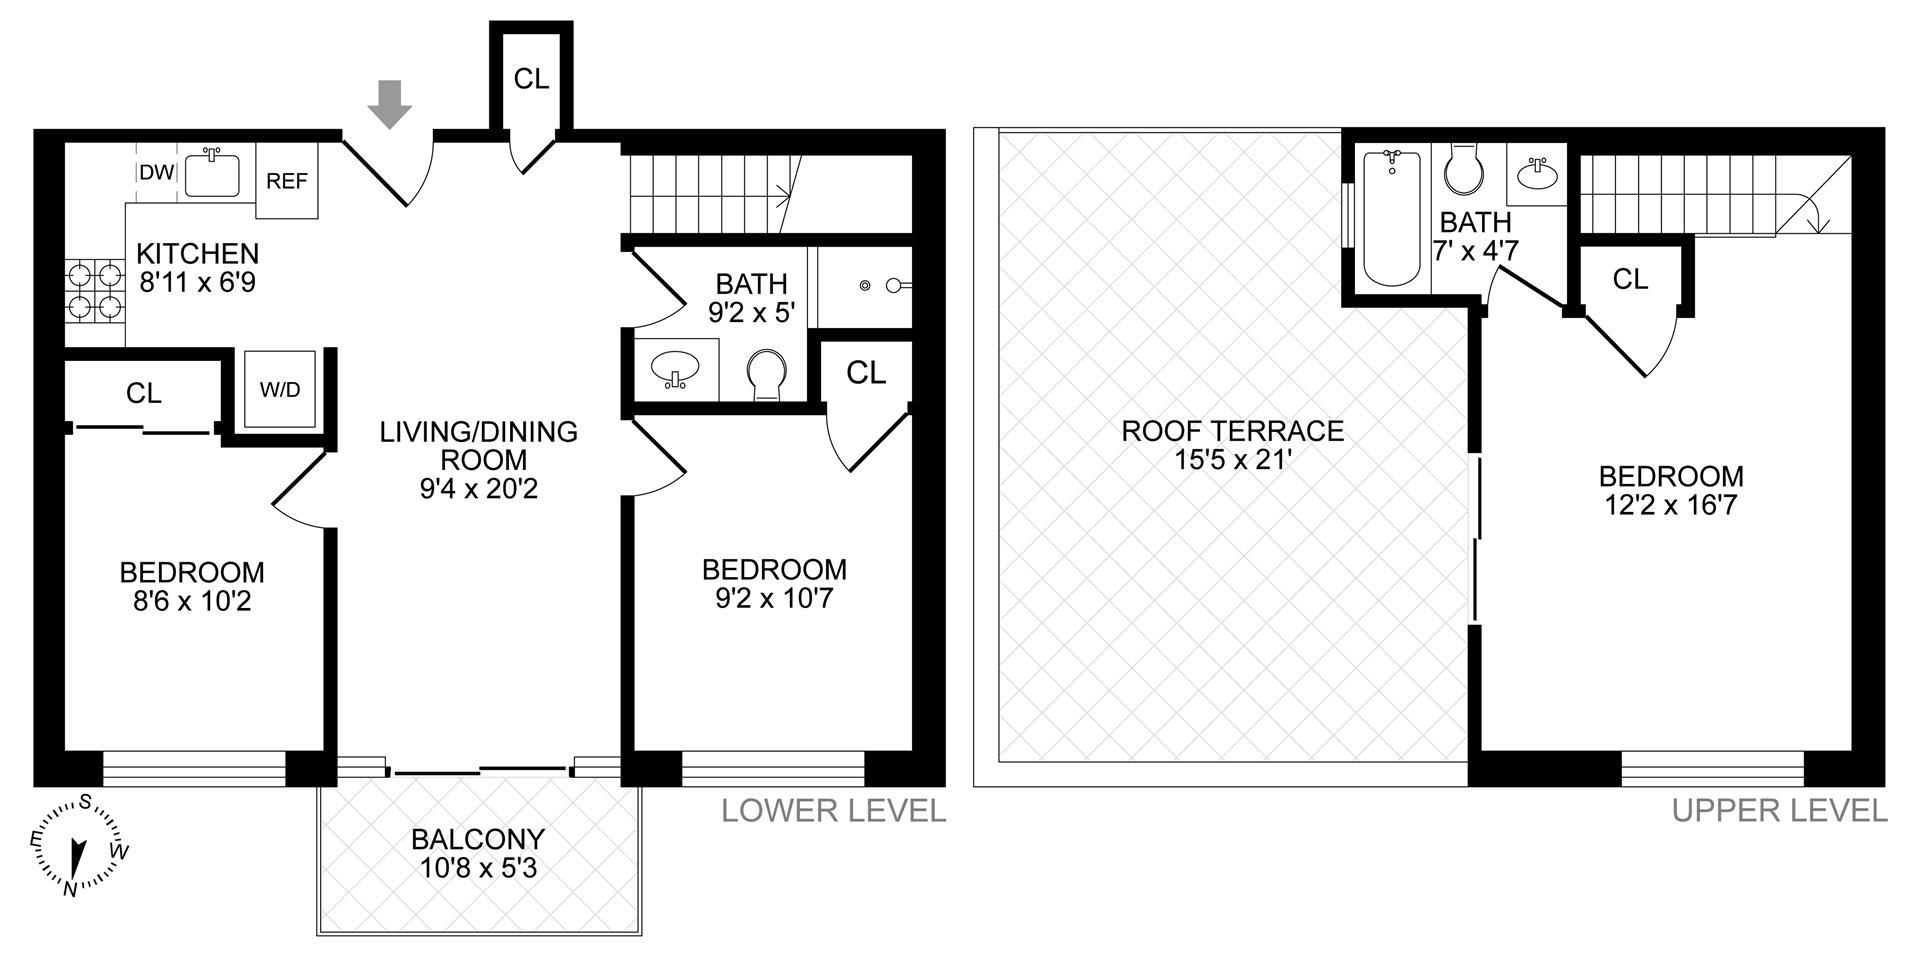 Floor plan of 294 Quincy St, 4F - Bedford - Stuyvesant, New York